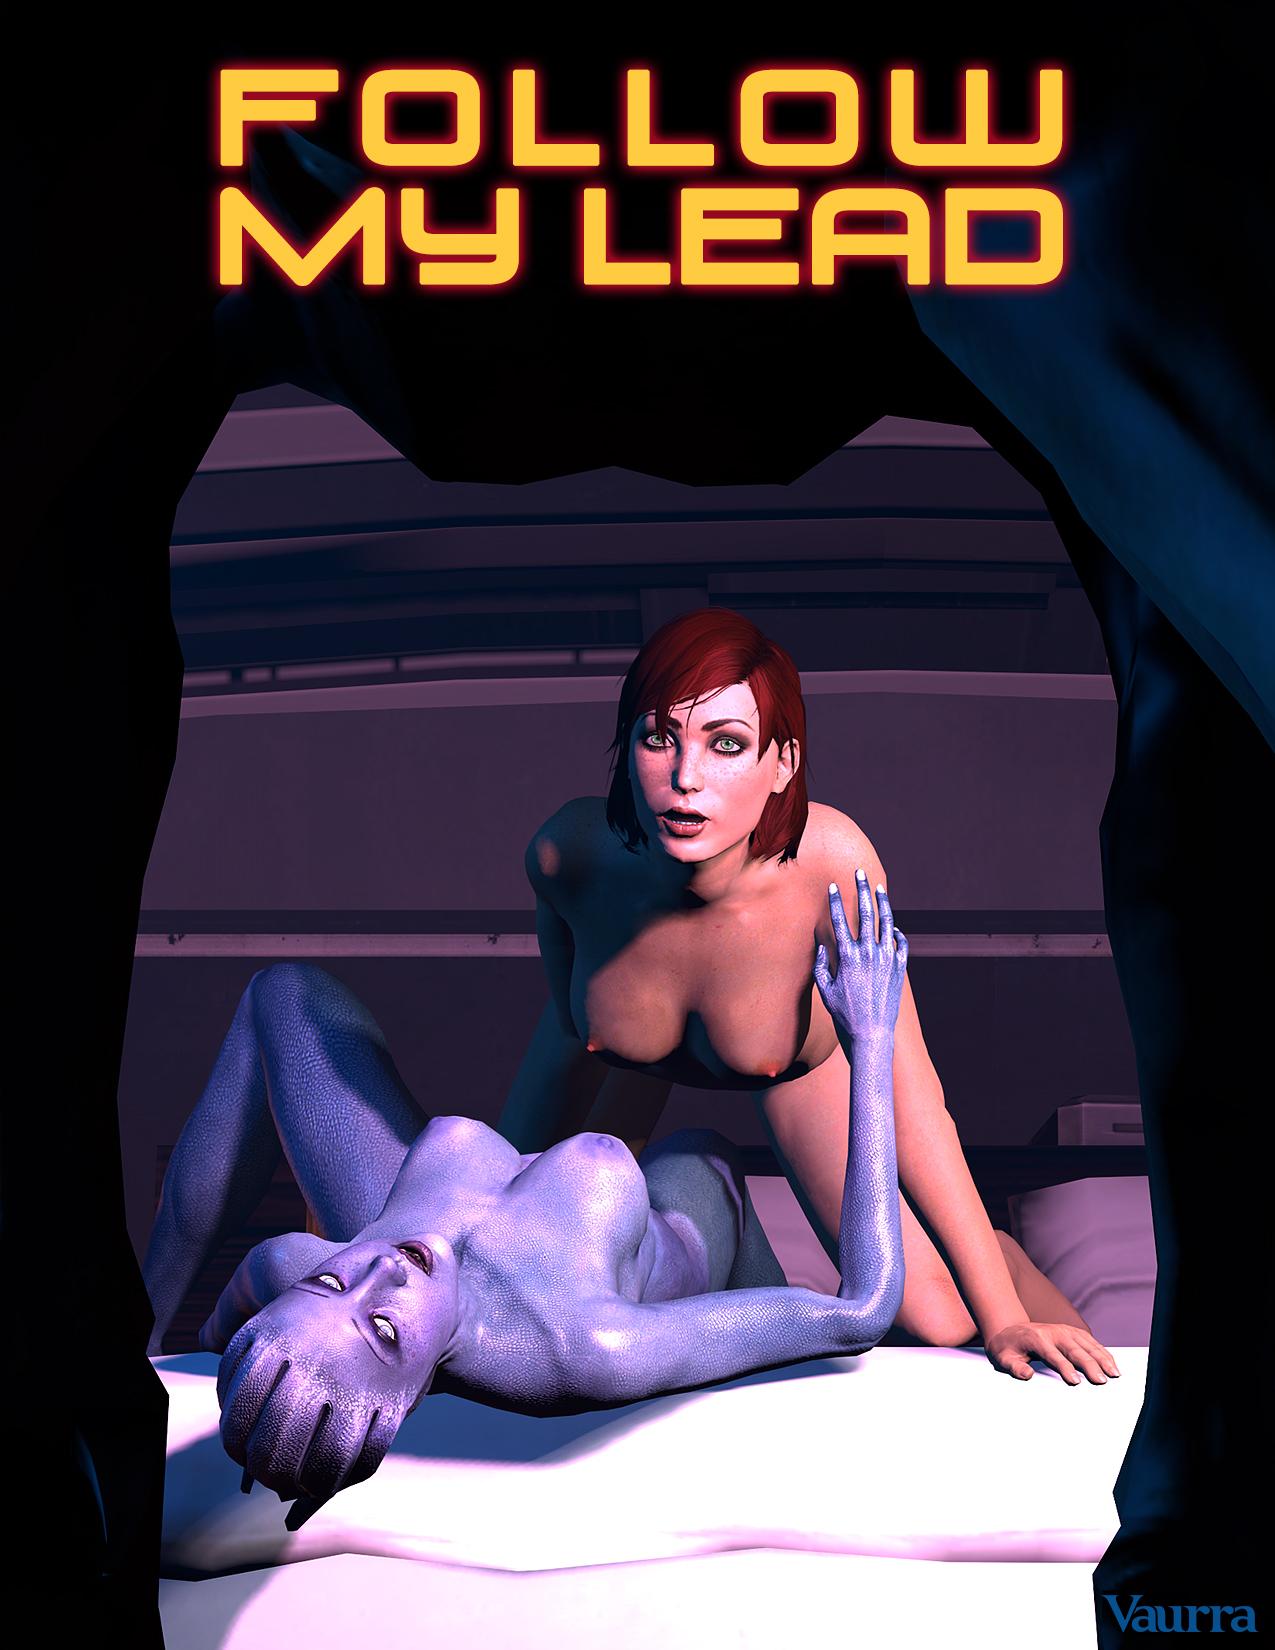 SureFap xxx porno Mass Effect - [Vaurra] - Follow My Lead